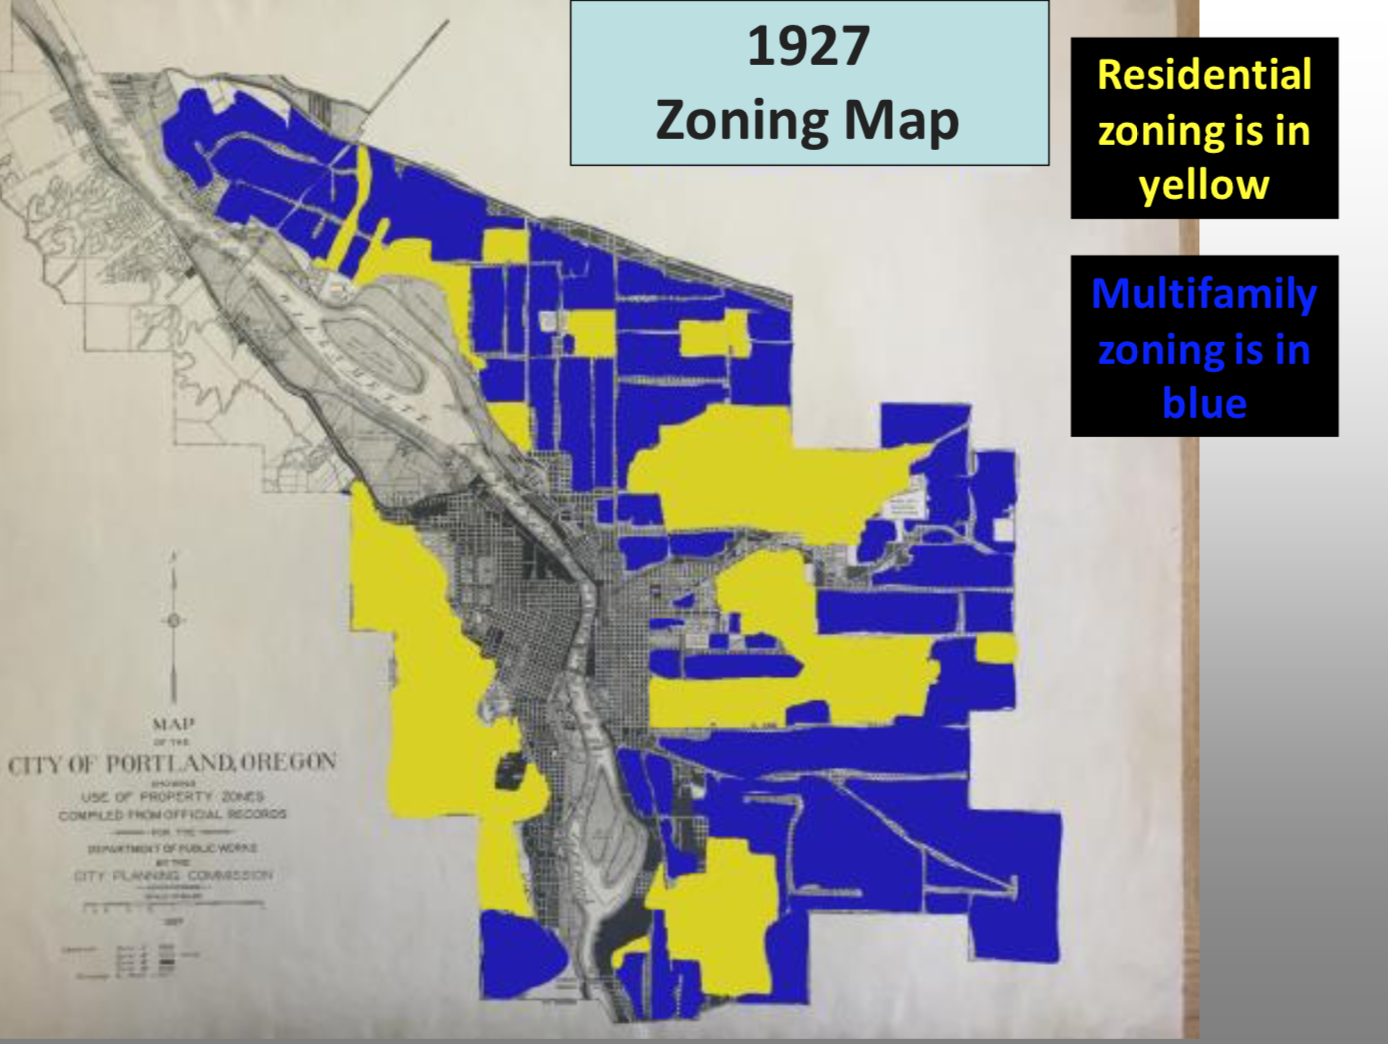 1927 Zoning Map